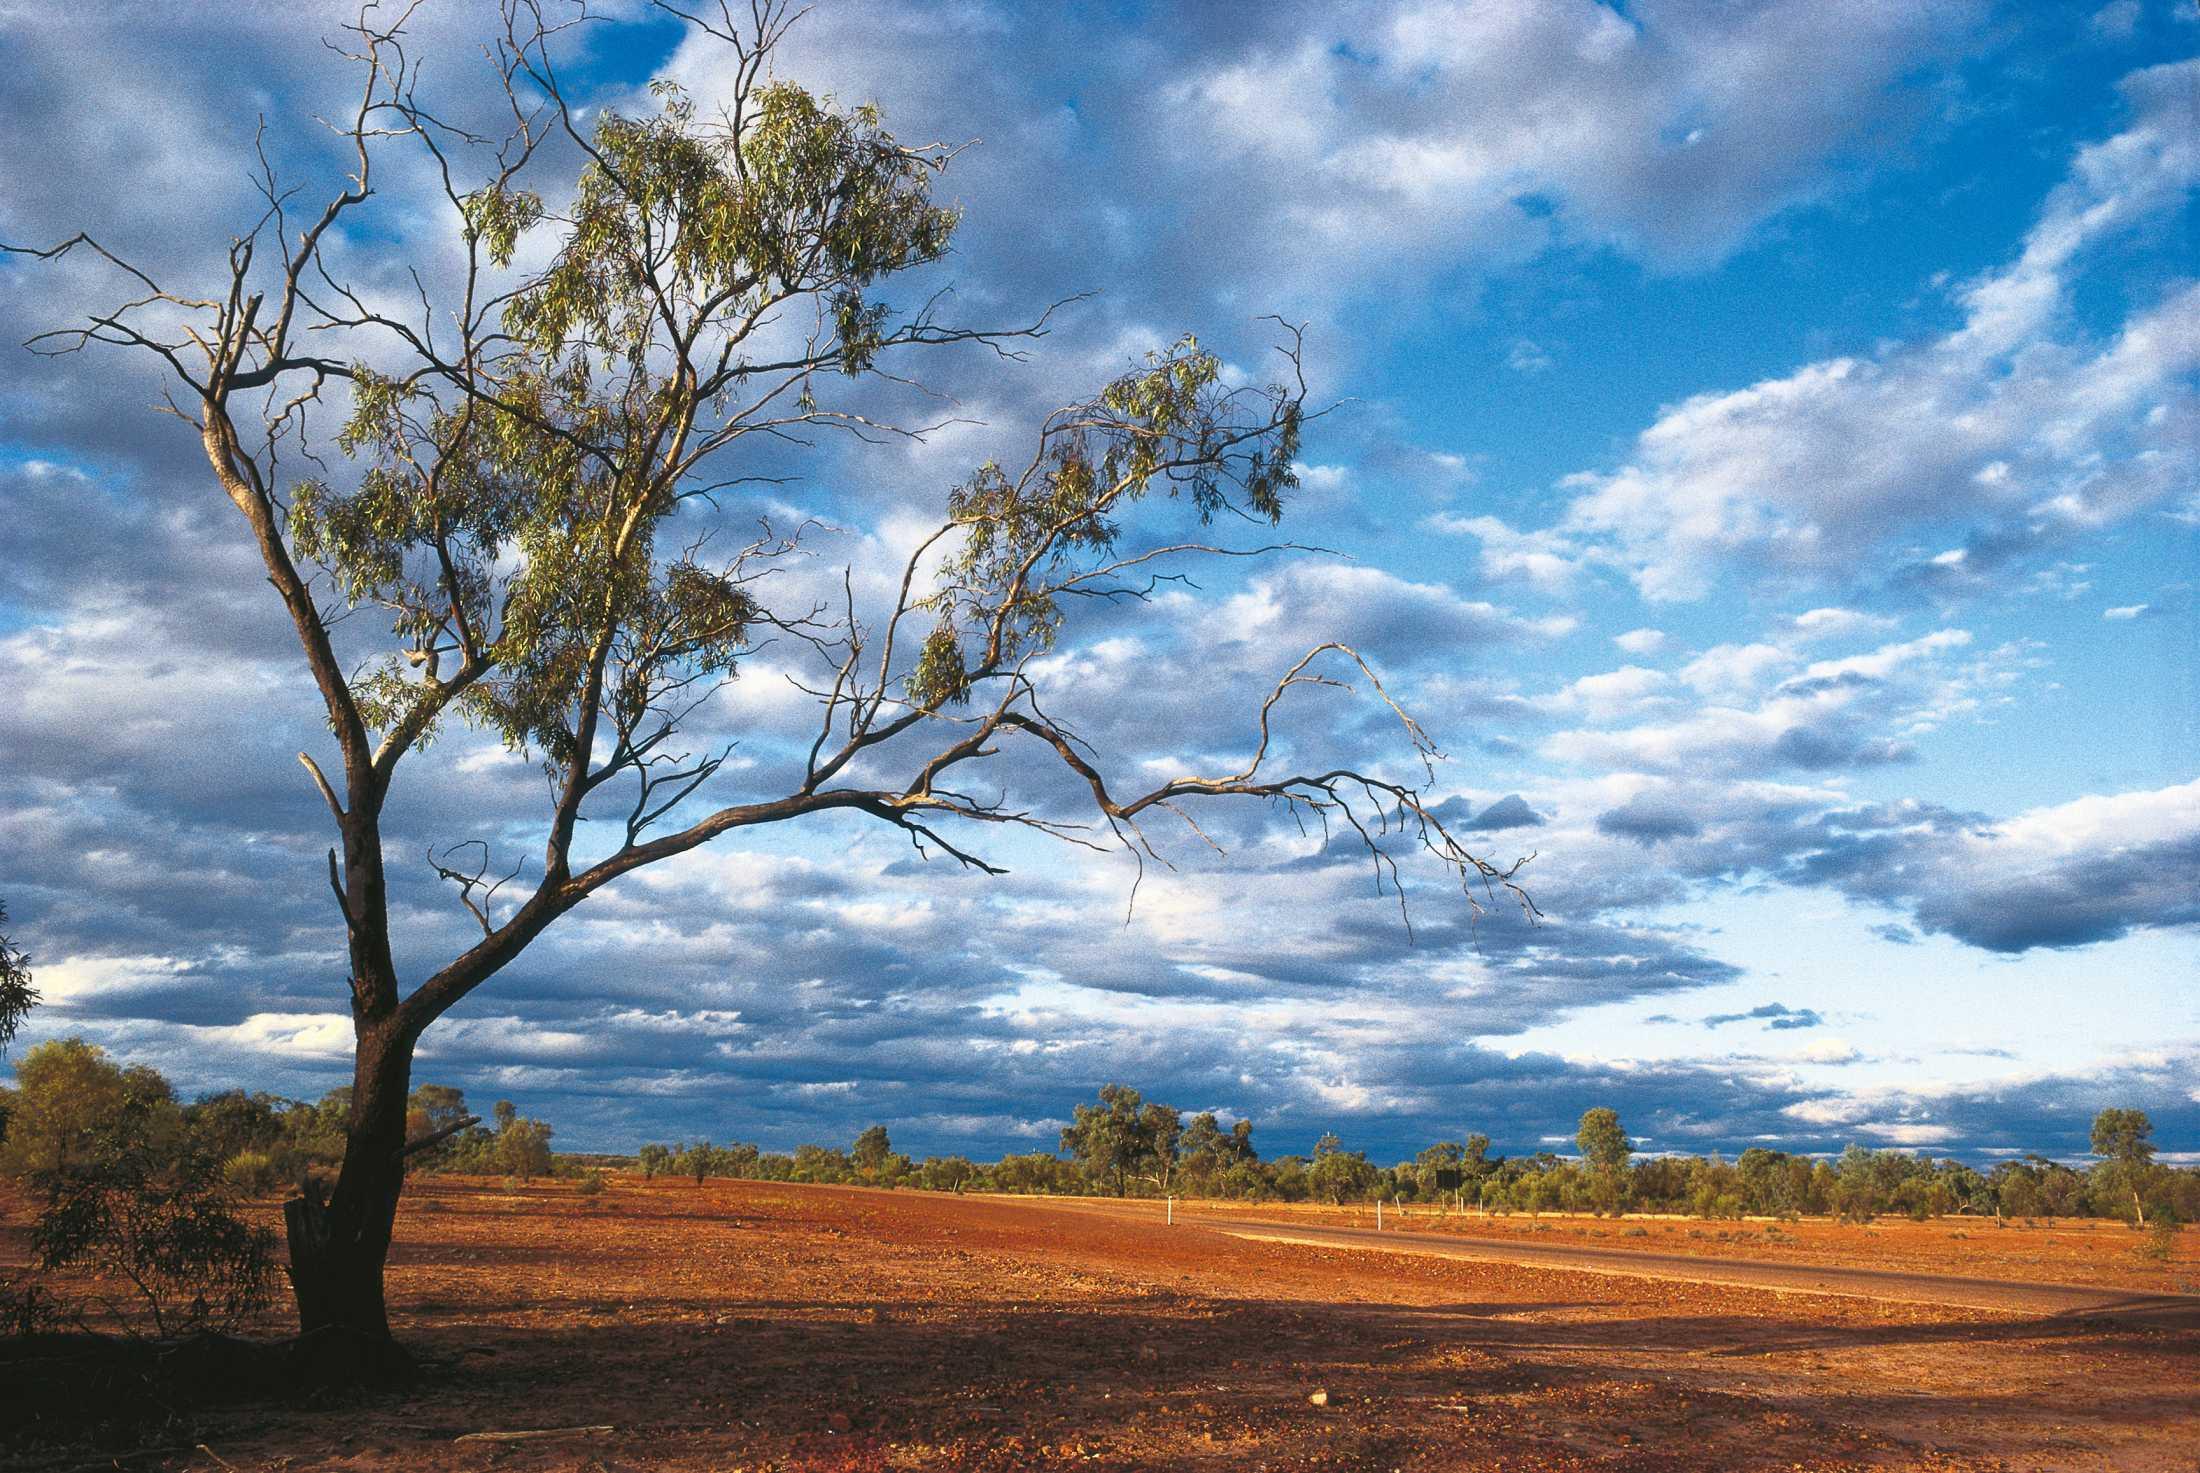 Cunnamulla-Outback-track-Medium-Res.jpg